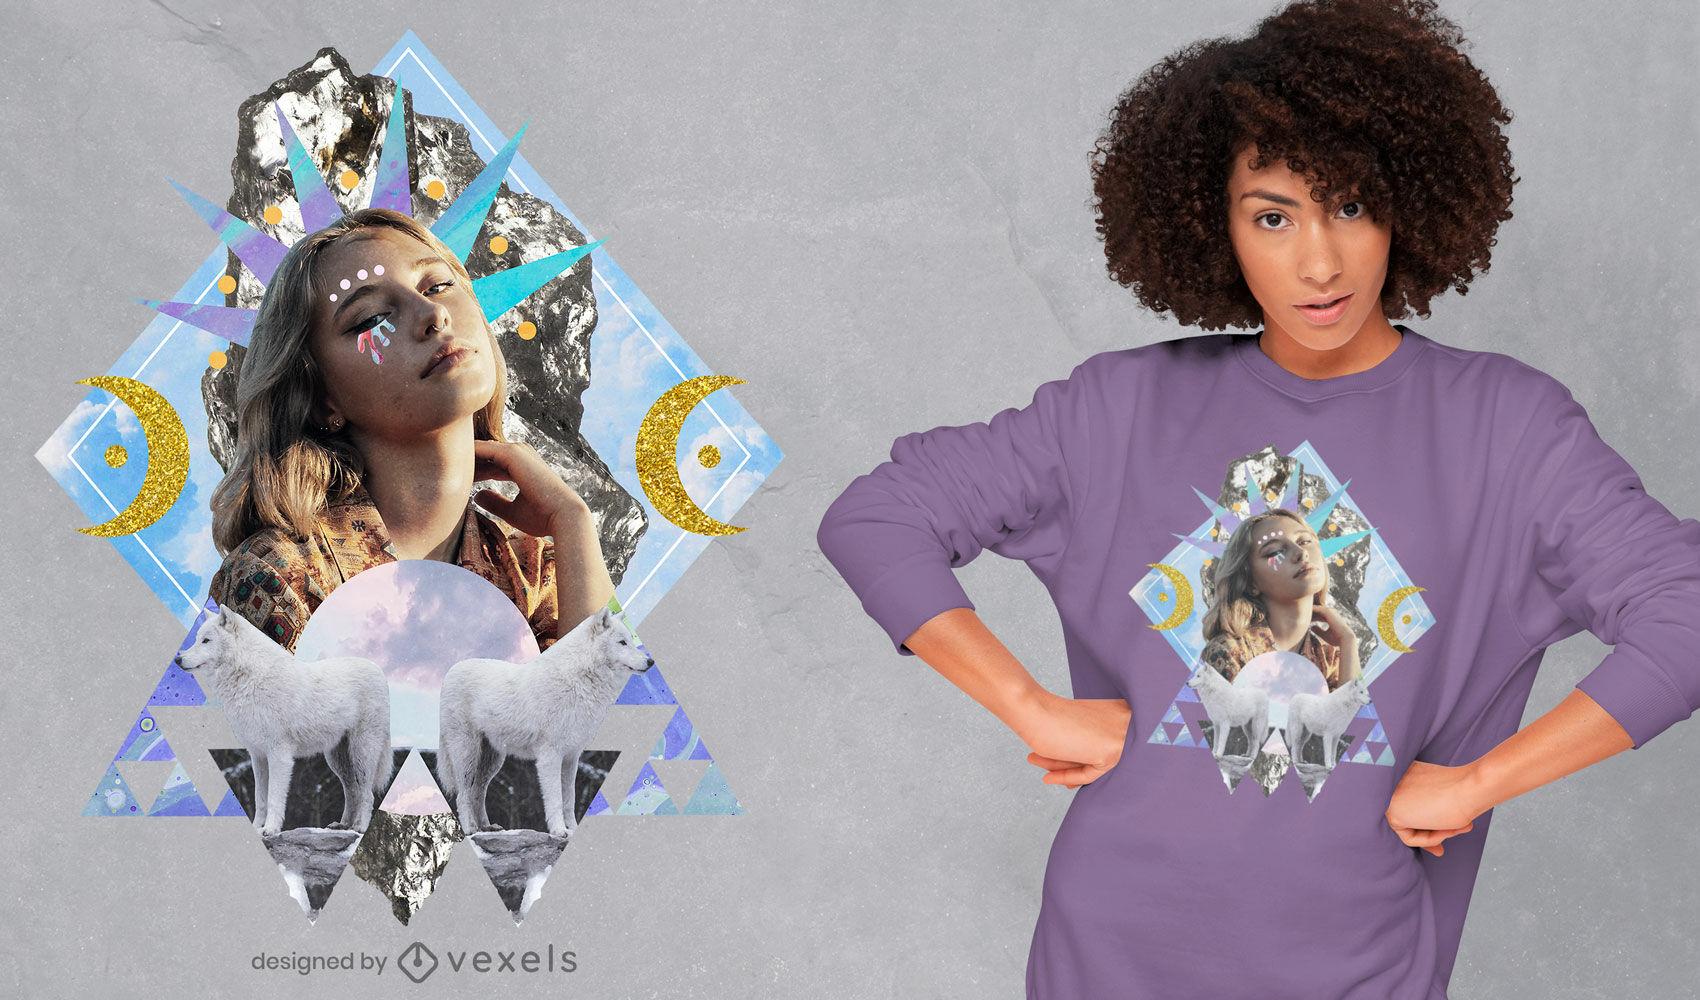 Camiseta collage fantas?a m?stica psd